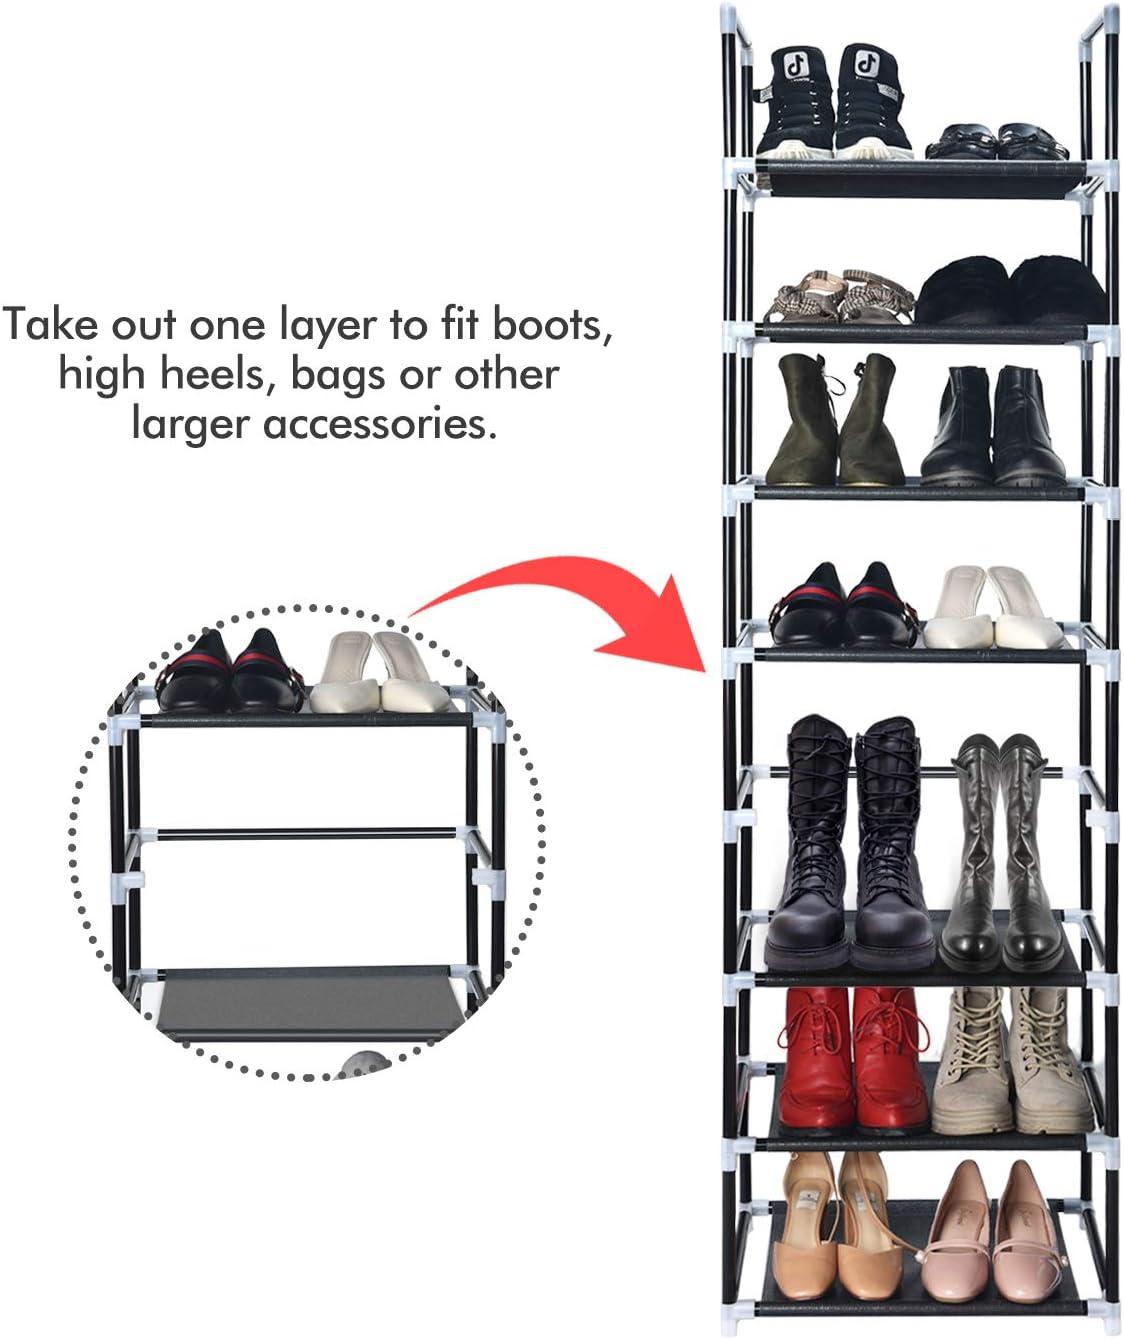 8 Tier Space Saving Storage Organizer Shoes Tower Rack Free Standing Closet